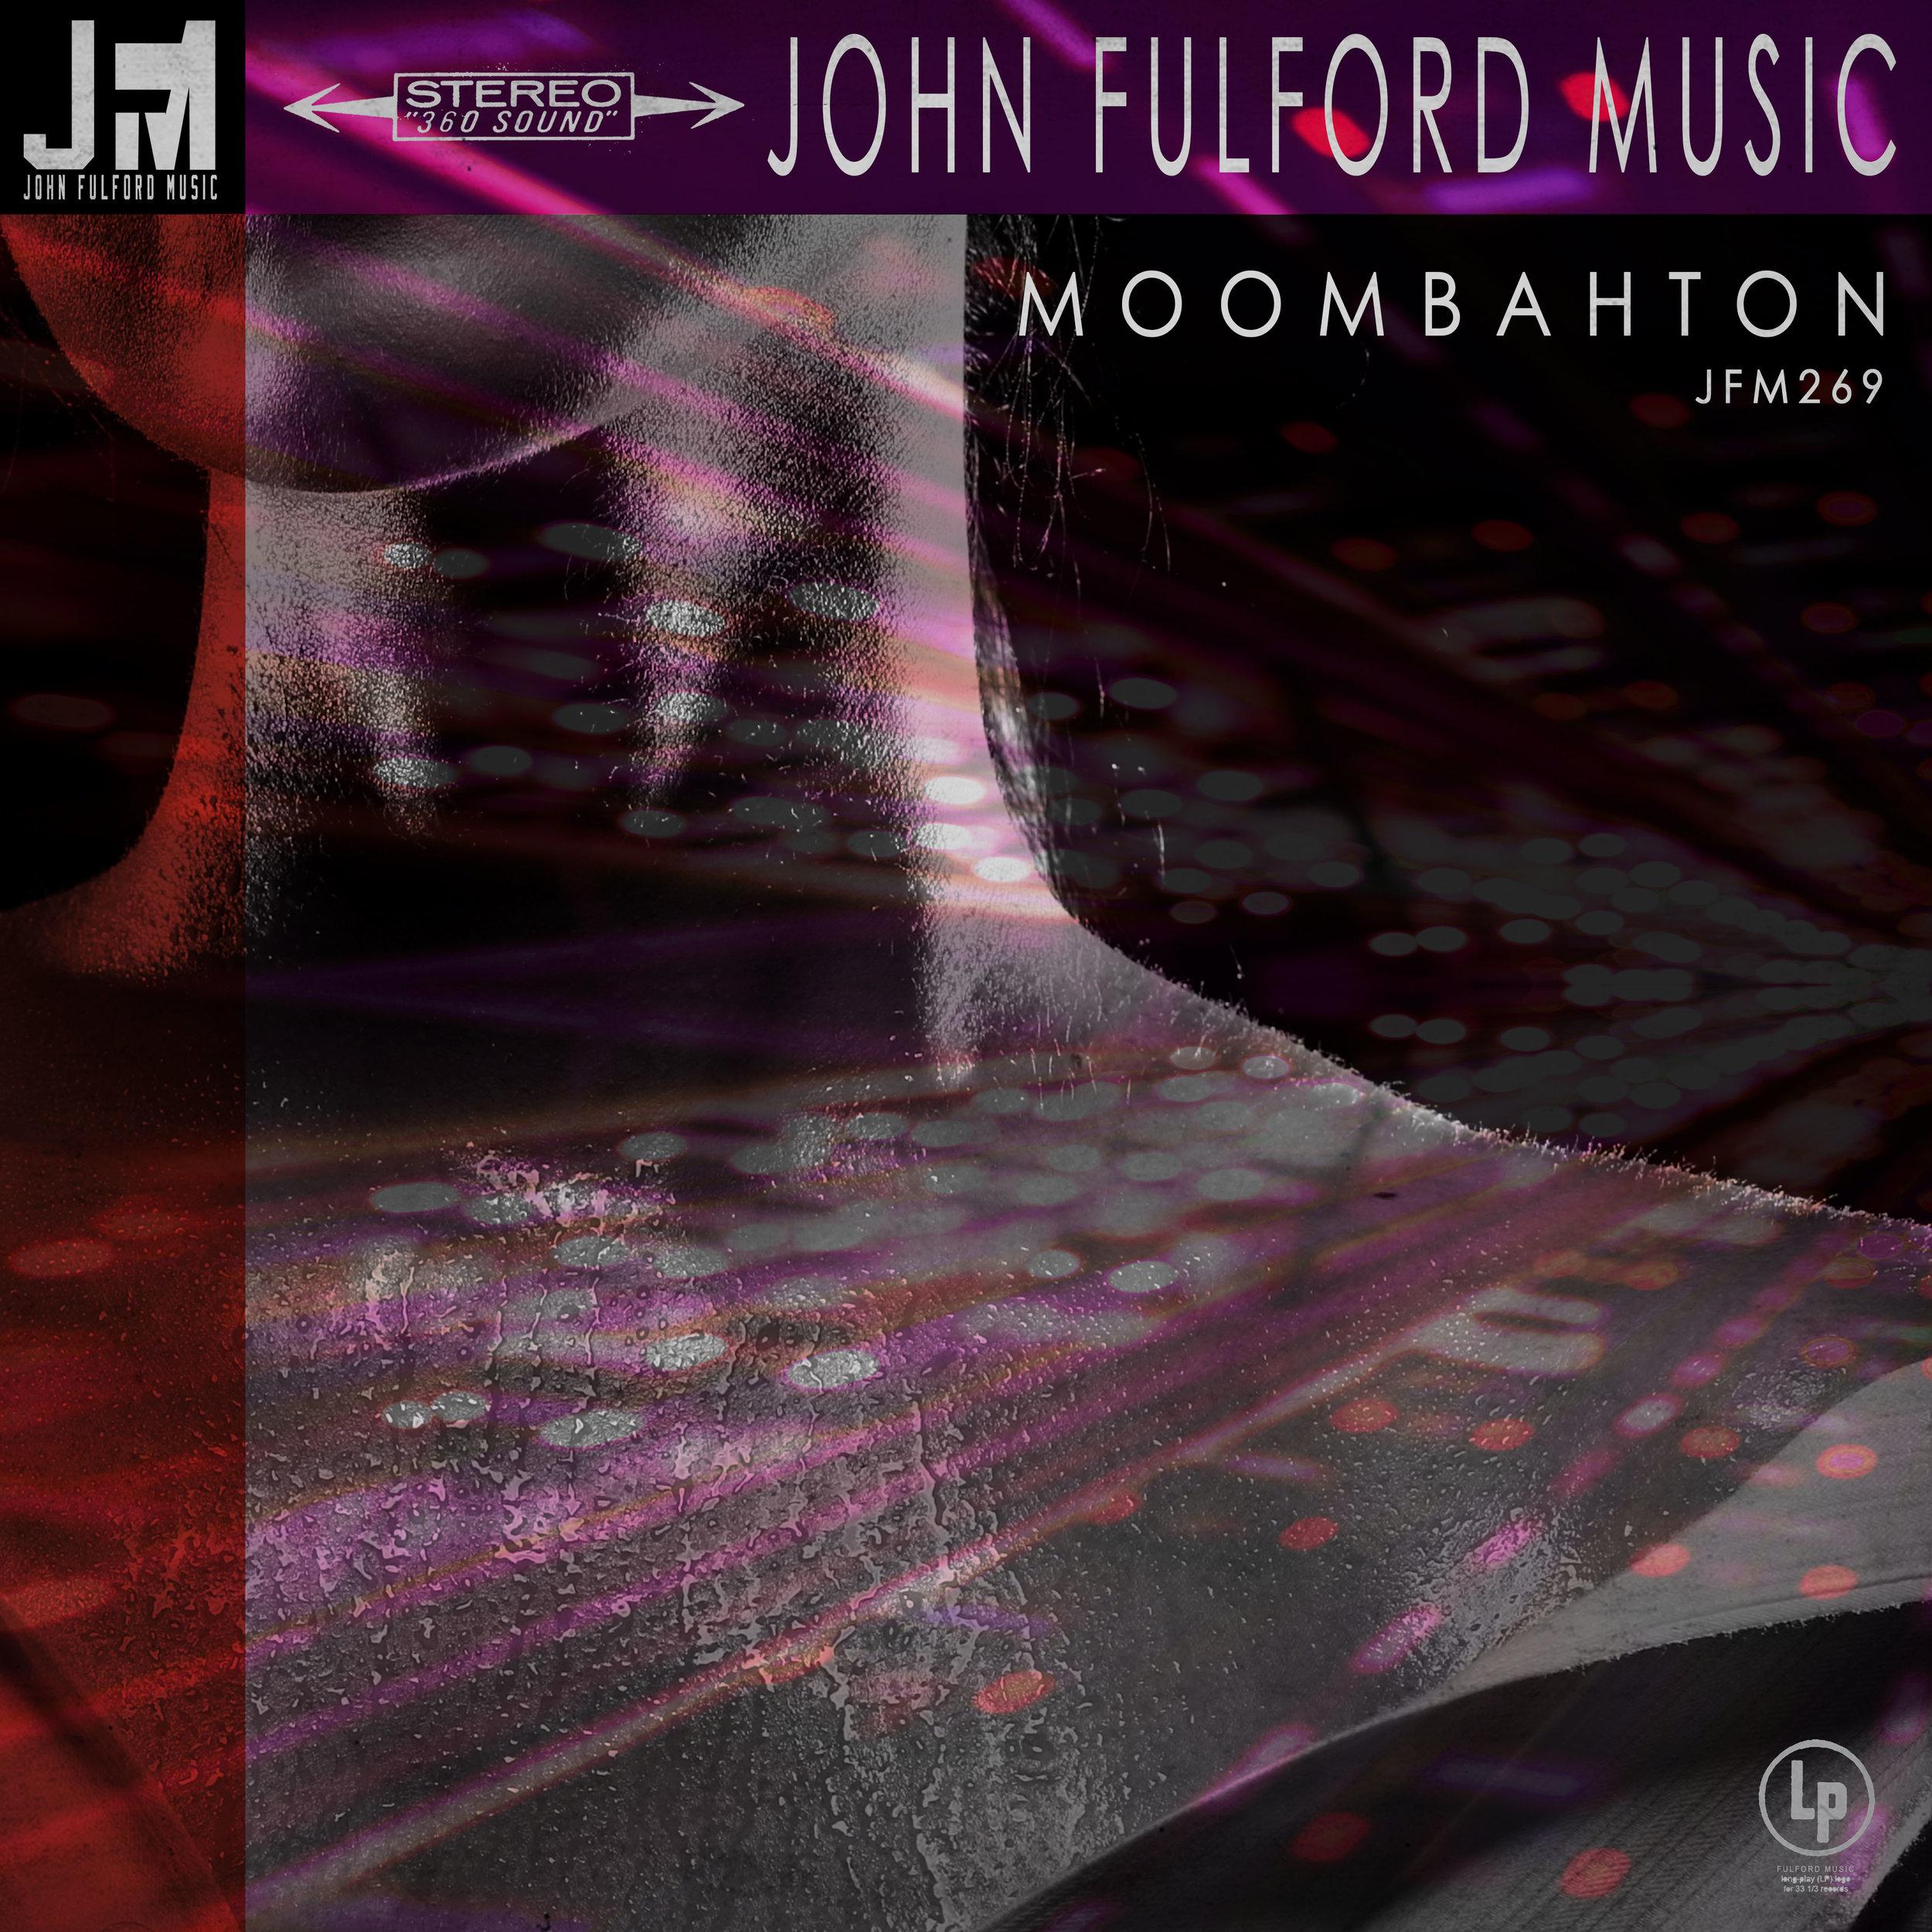 FULFORD-a-MOOMBAHTON.jpg